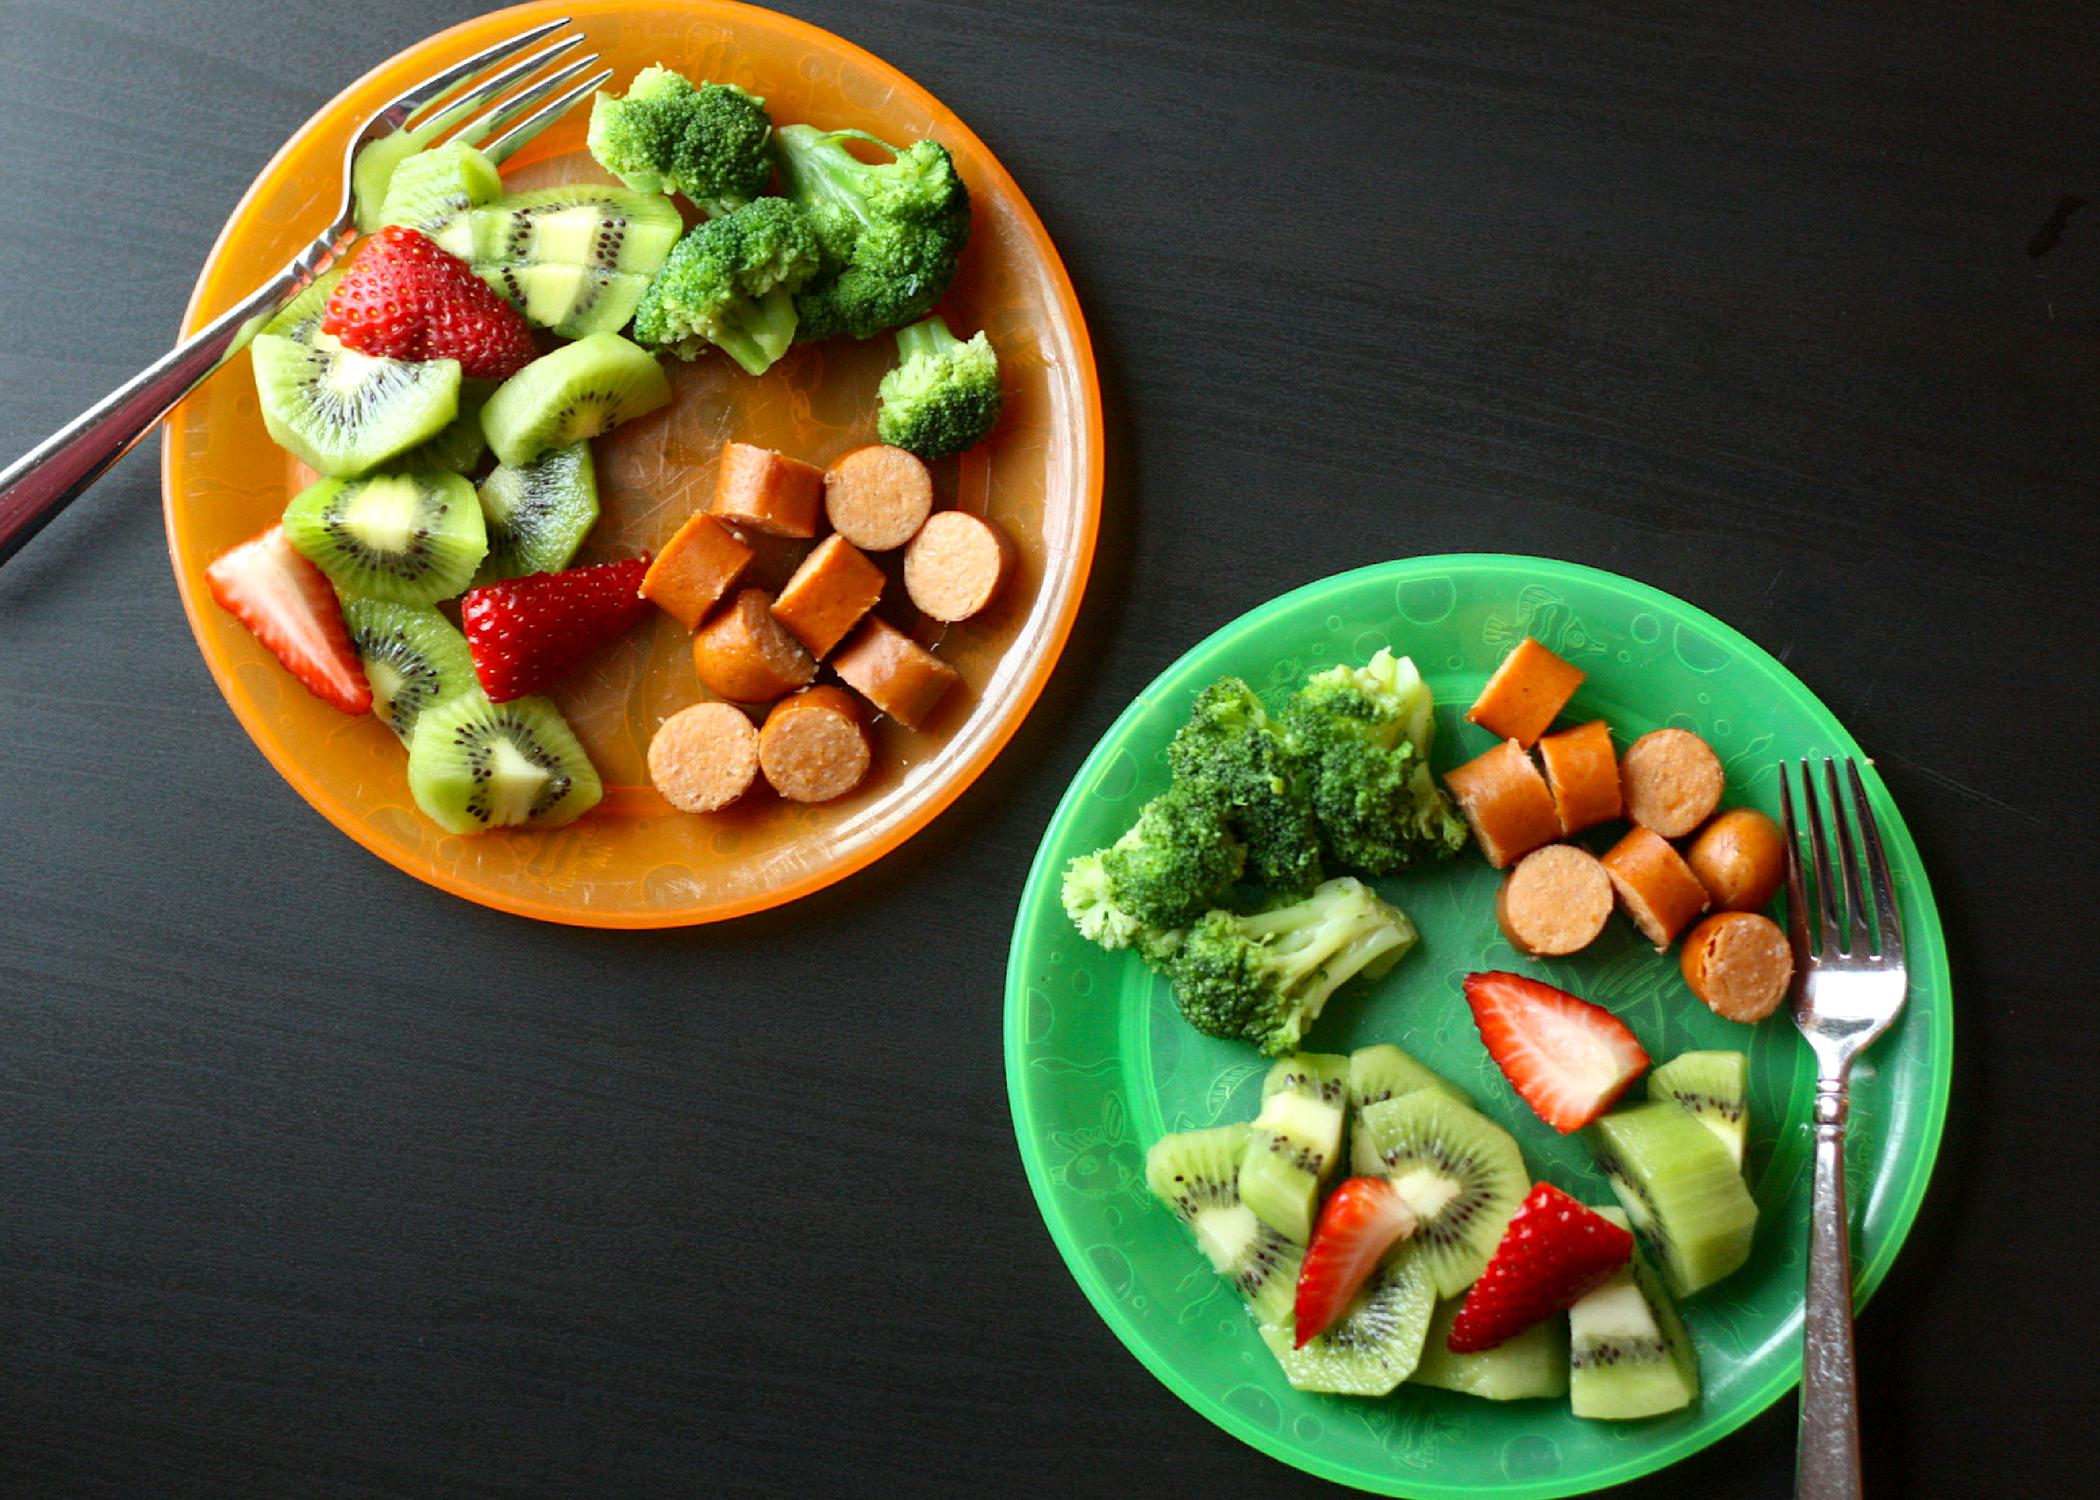 Feeding kids chicken hotdogs, frozen broccoli and fruit